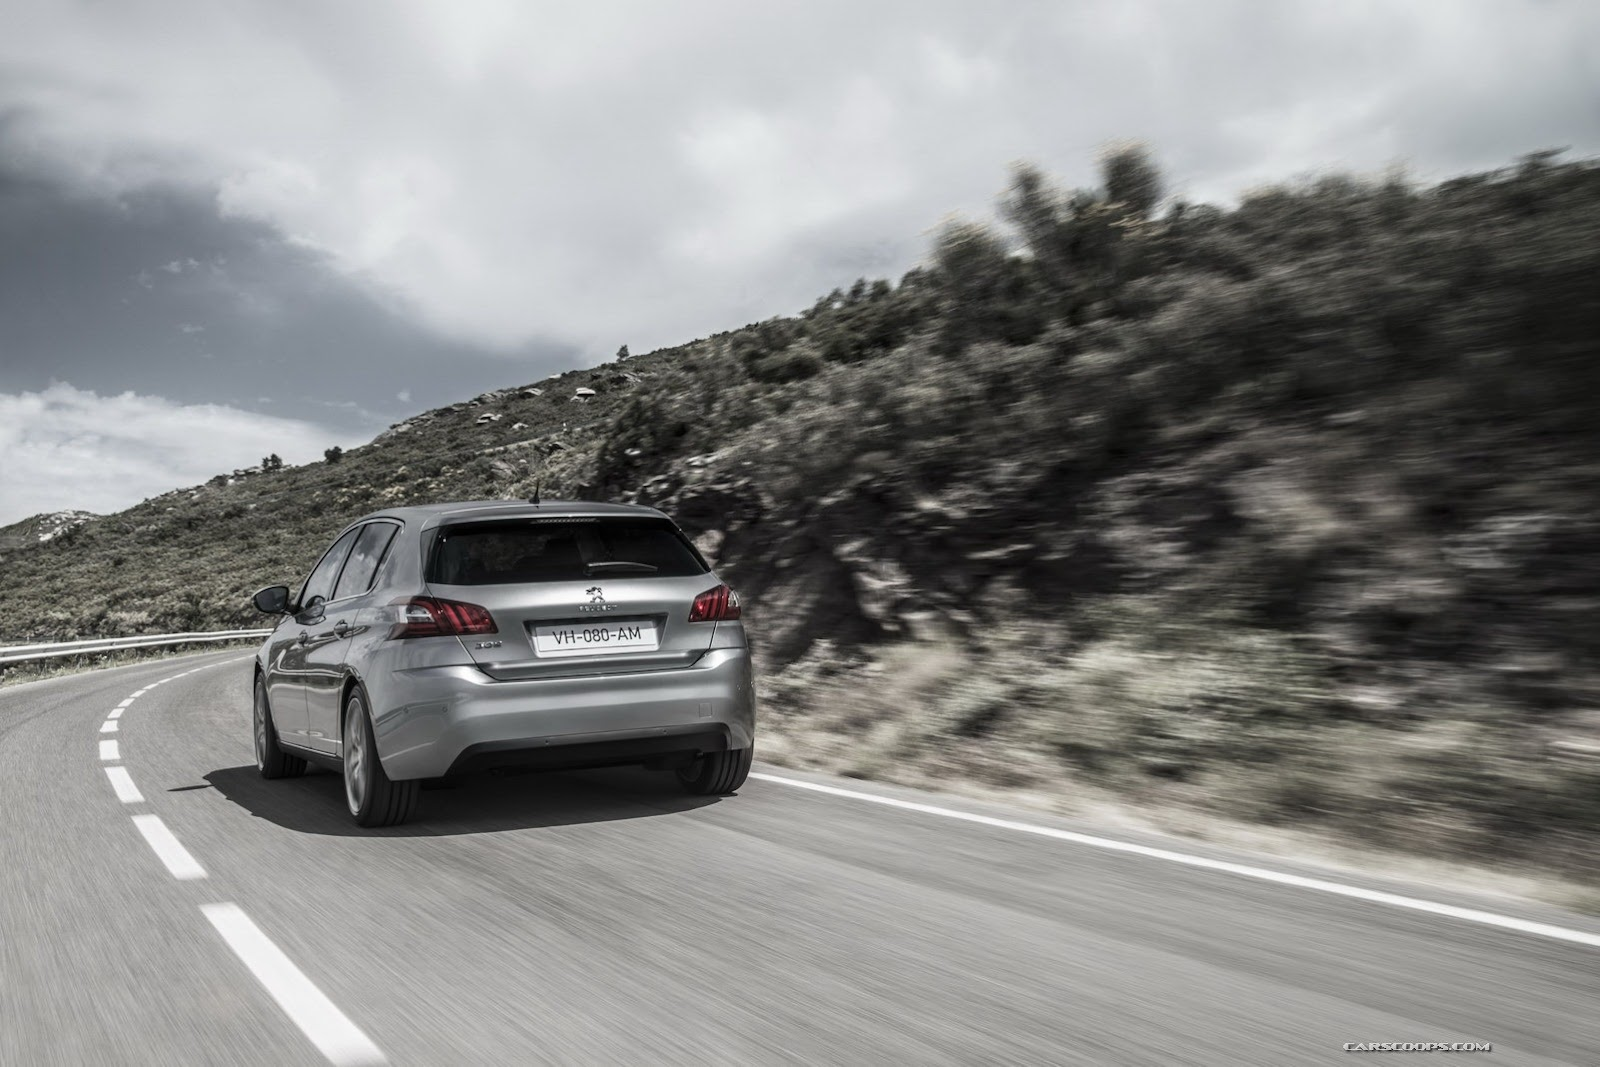 2014-Peugeot-308-Hatch-Carscoops-95%25255B2%25255D.jpg